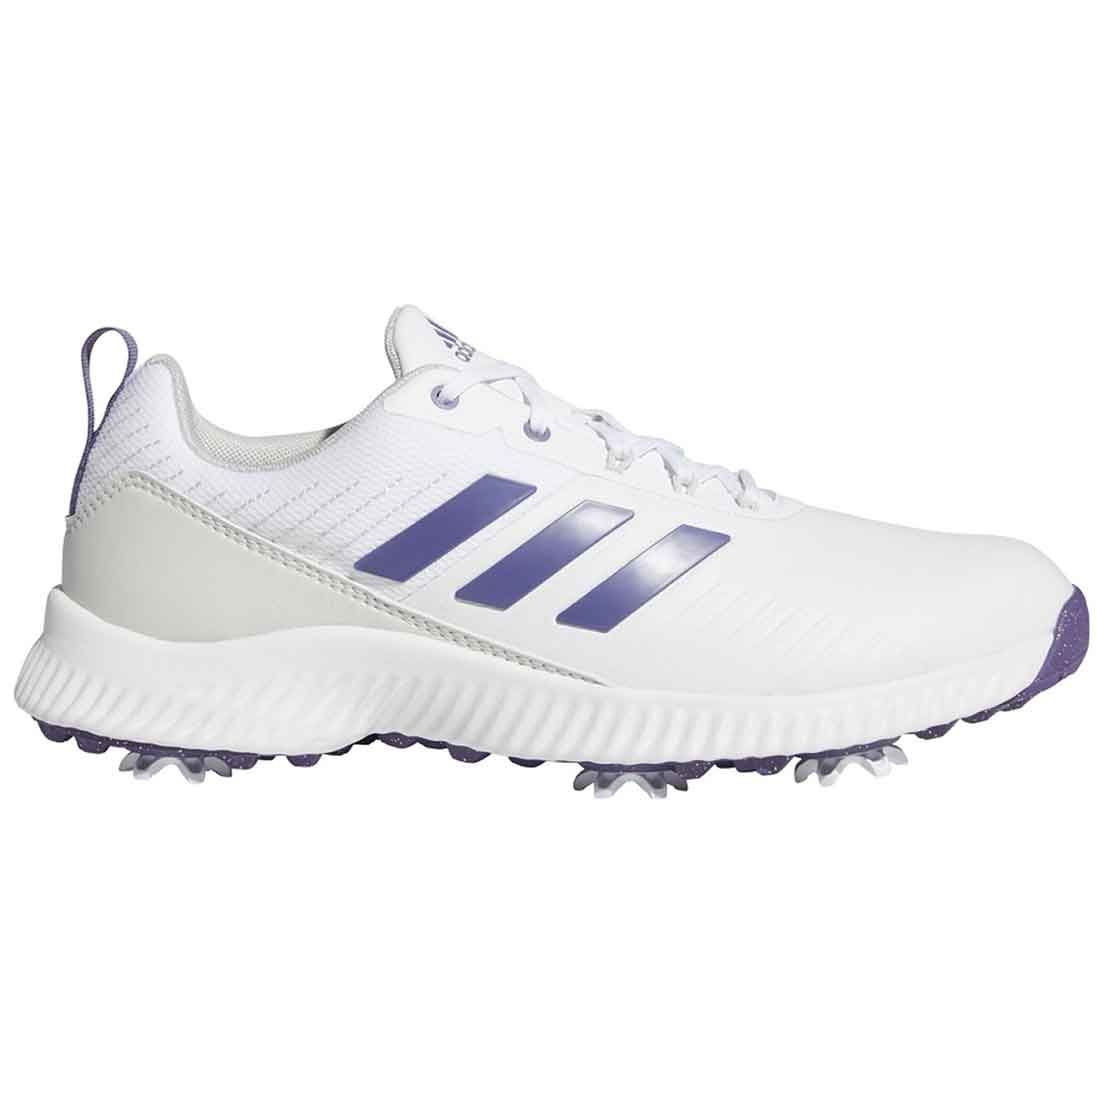 Buy Adidas Women S Response Bounce 2 0 Golf Shoes White Purple Golf Discount